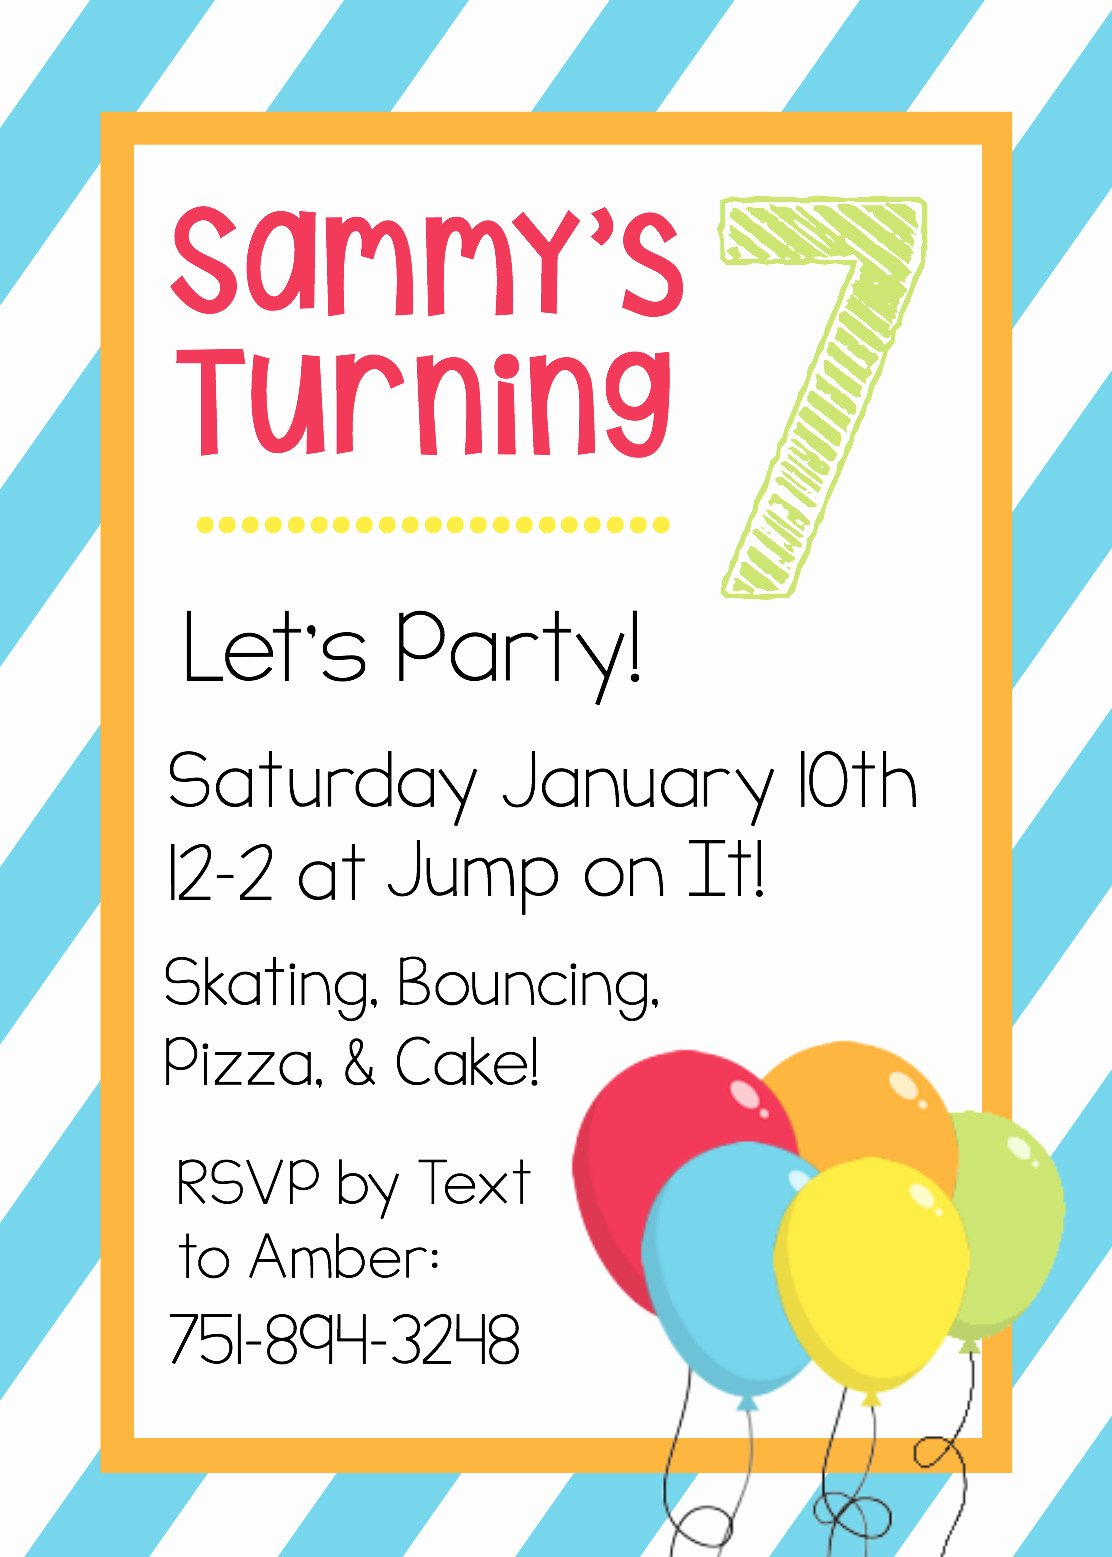 Free Printable Birthday Invitation Templates Awesome Free Printable Birthday Invitation Templates